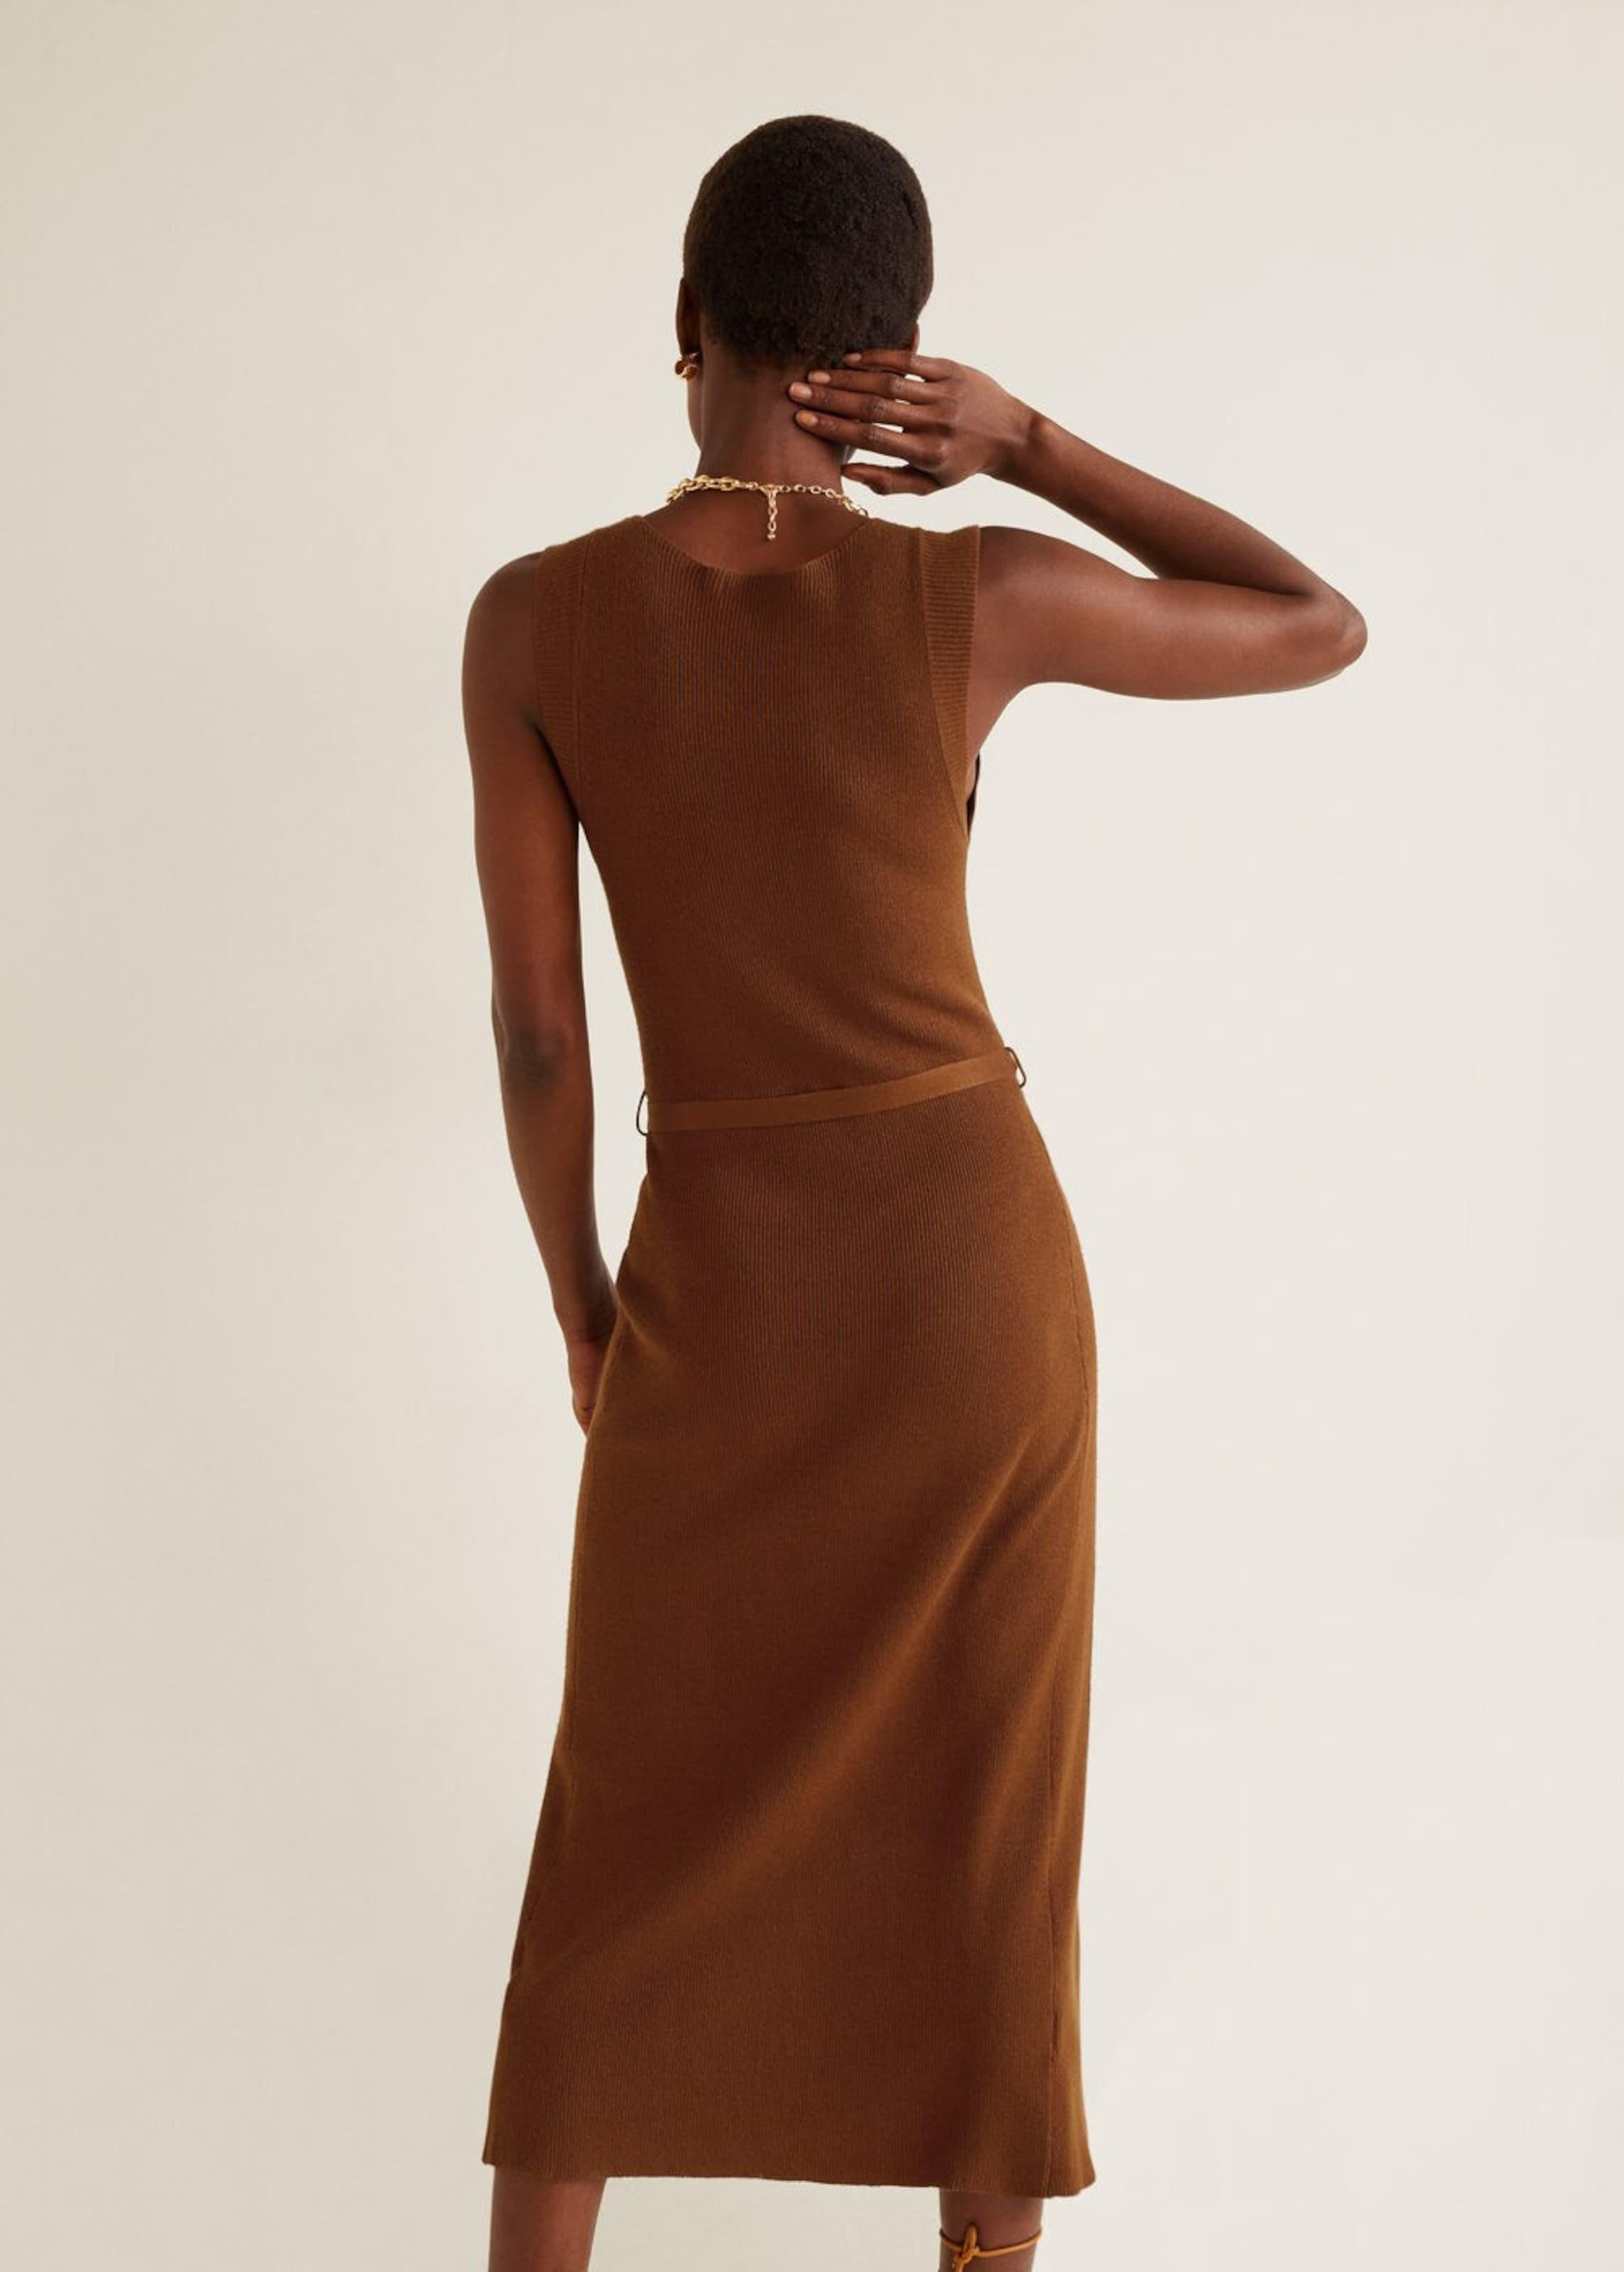 Kleid Kleid Mango Mango 'safari' In Karamell qGUSzMVp